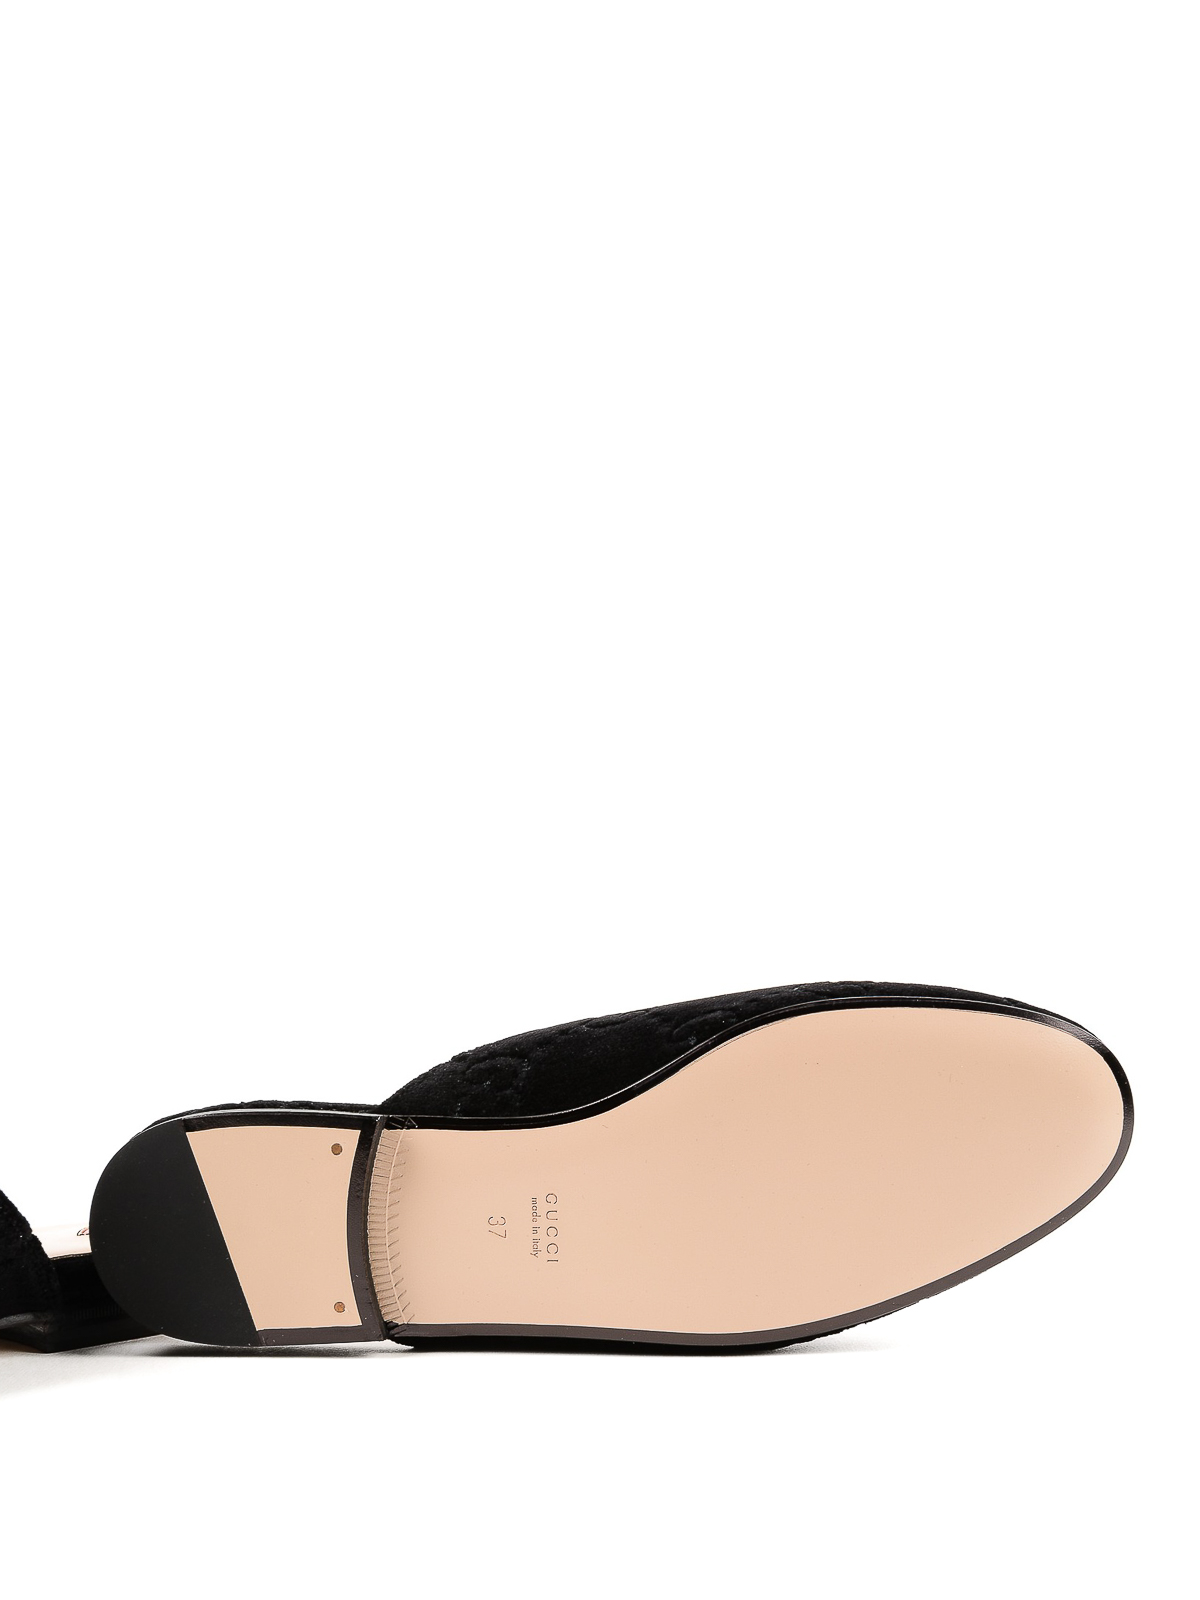 9b3edc9cda9 Gucci - Princetown GG black velvet slippers - Loafers   Slippers ...